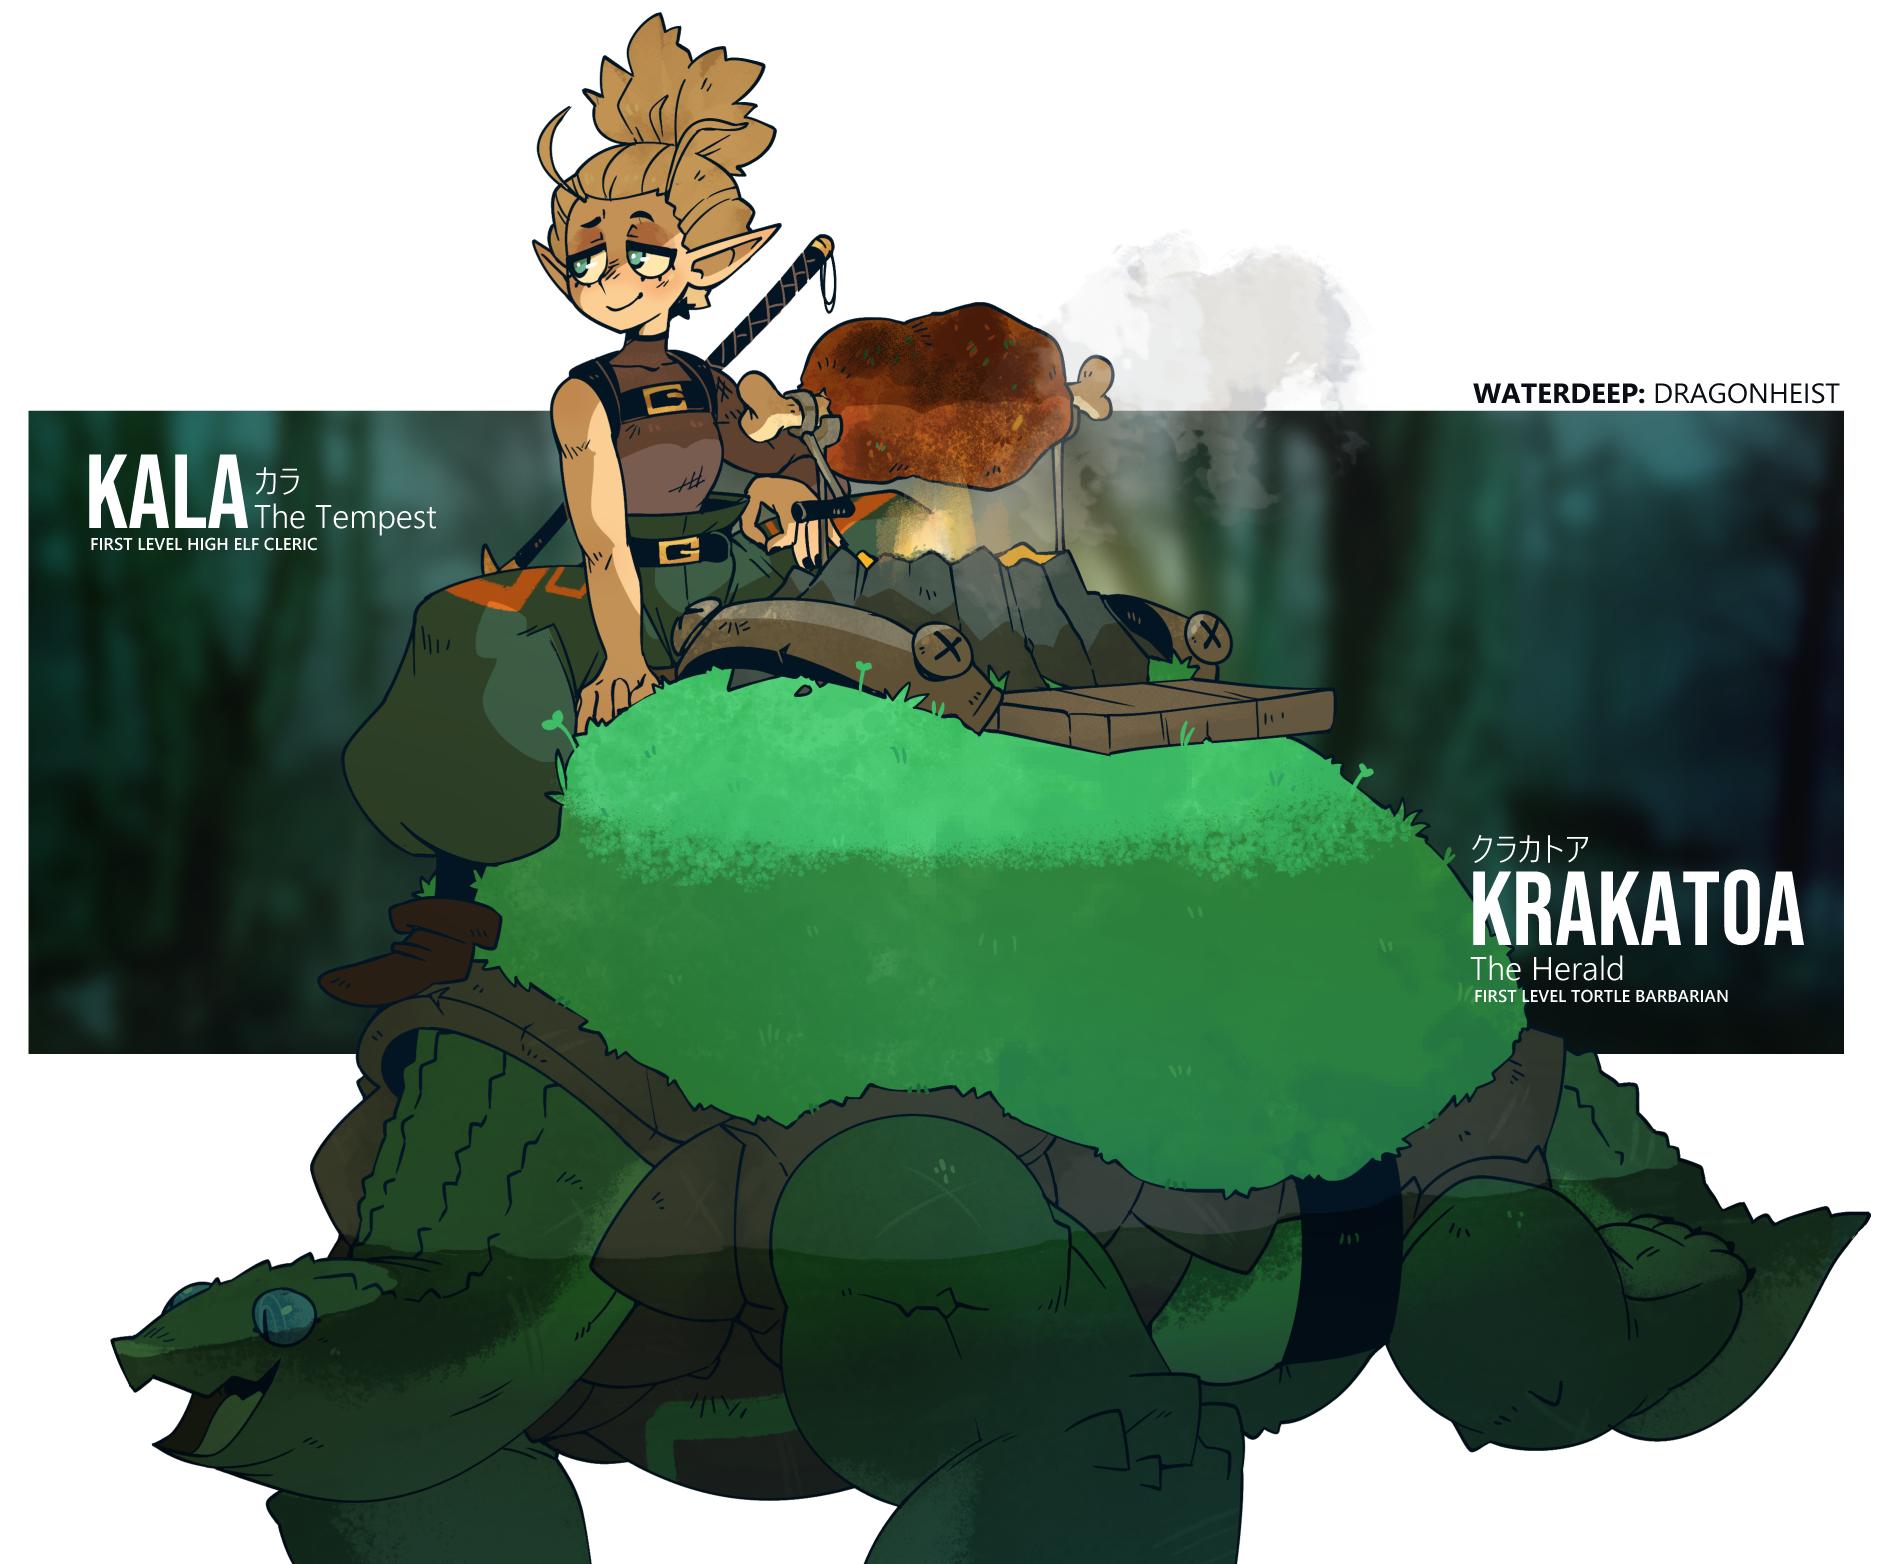 D&D - Krakatoa & Kala